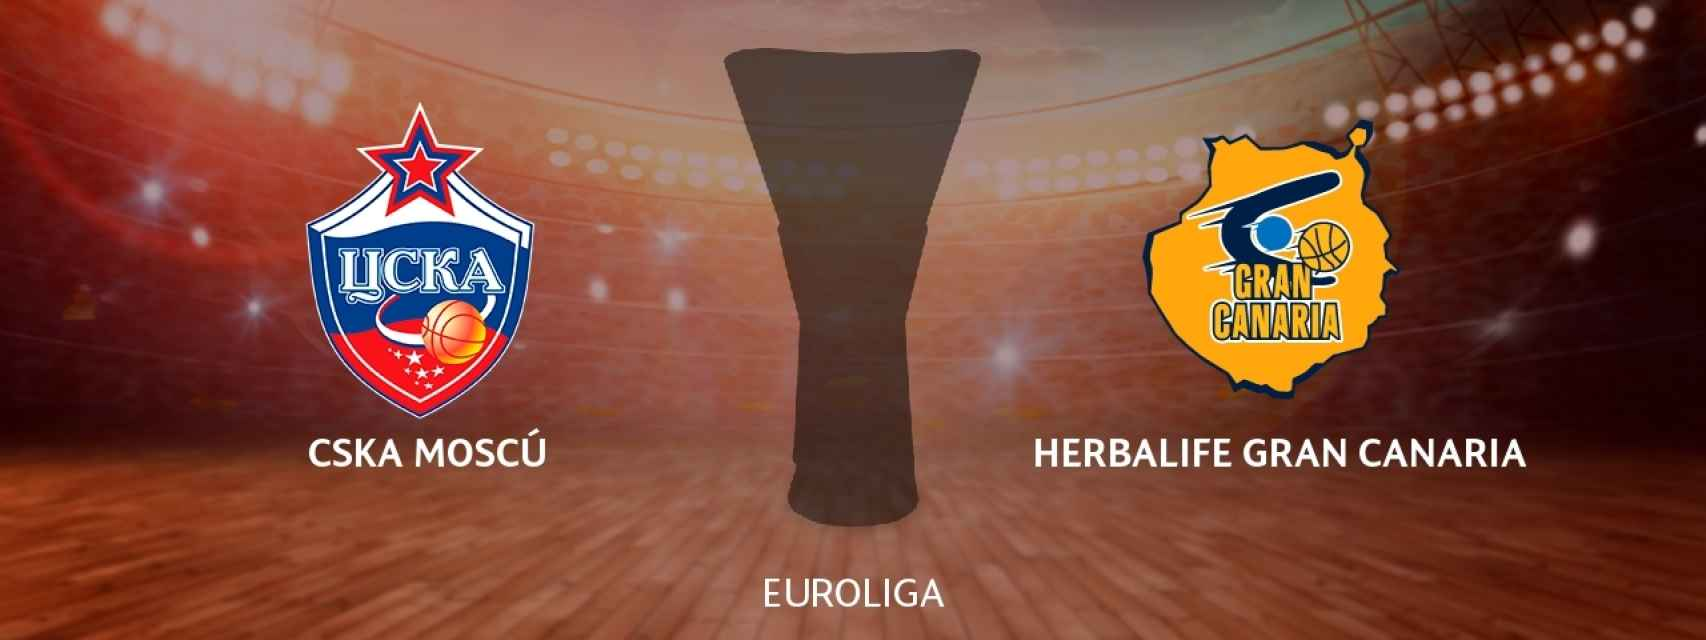 CSKA Moscú - Herbalife Gran Canaria